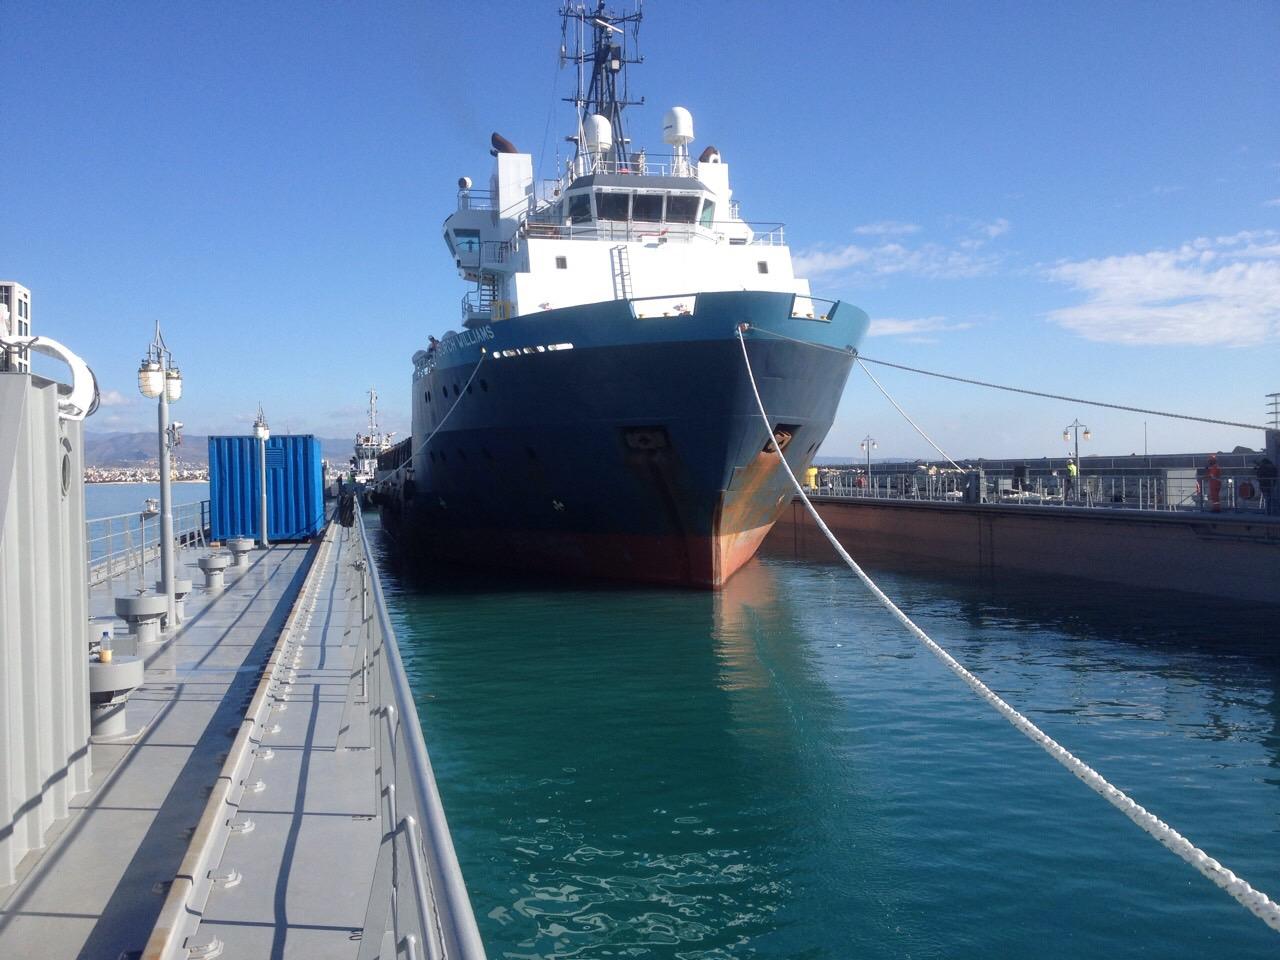 Floating Dock Ereneos Enters Operation in Limassol